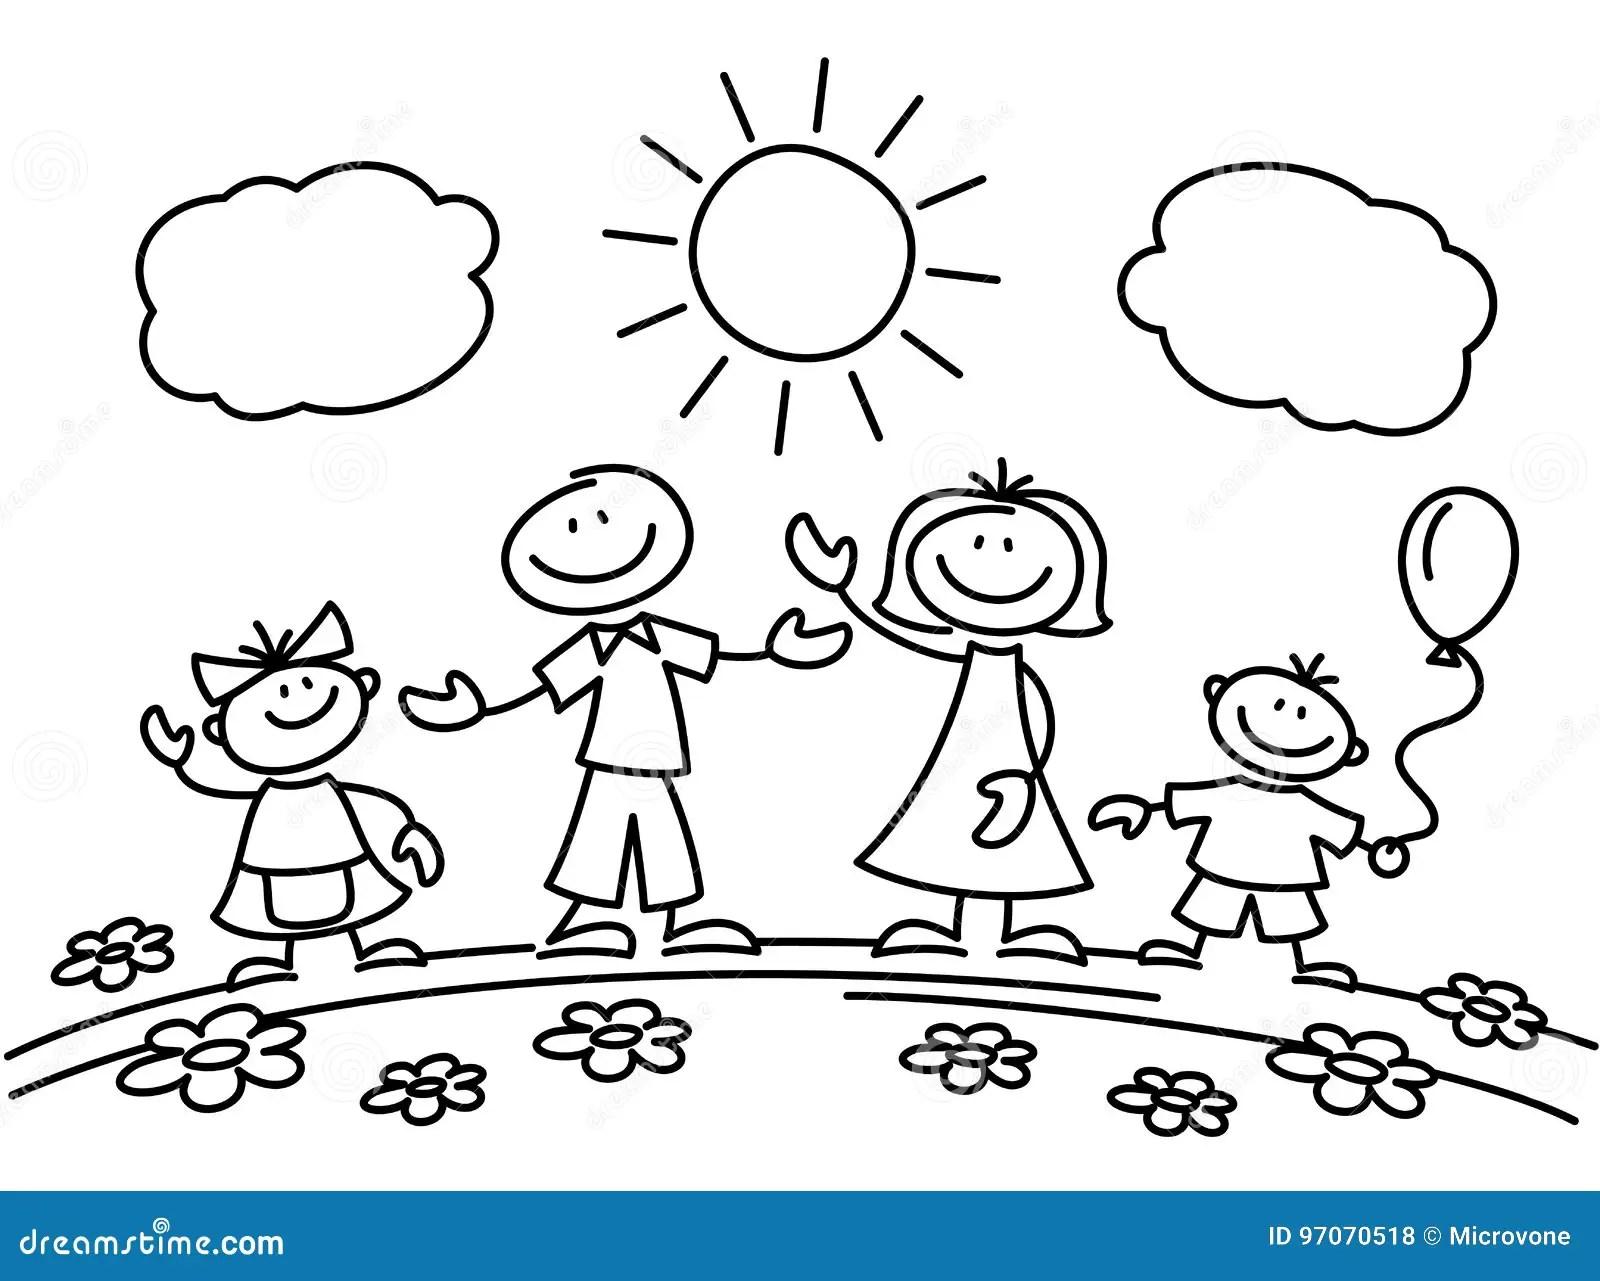 Hand Drawn Stick Figure Happy Family Vector Illustration